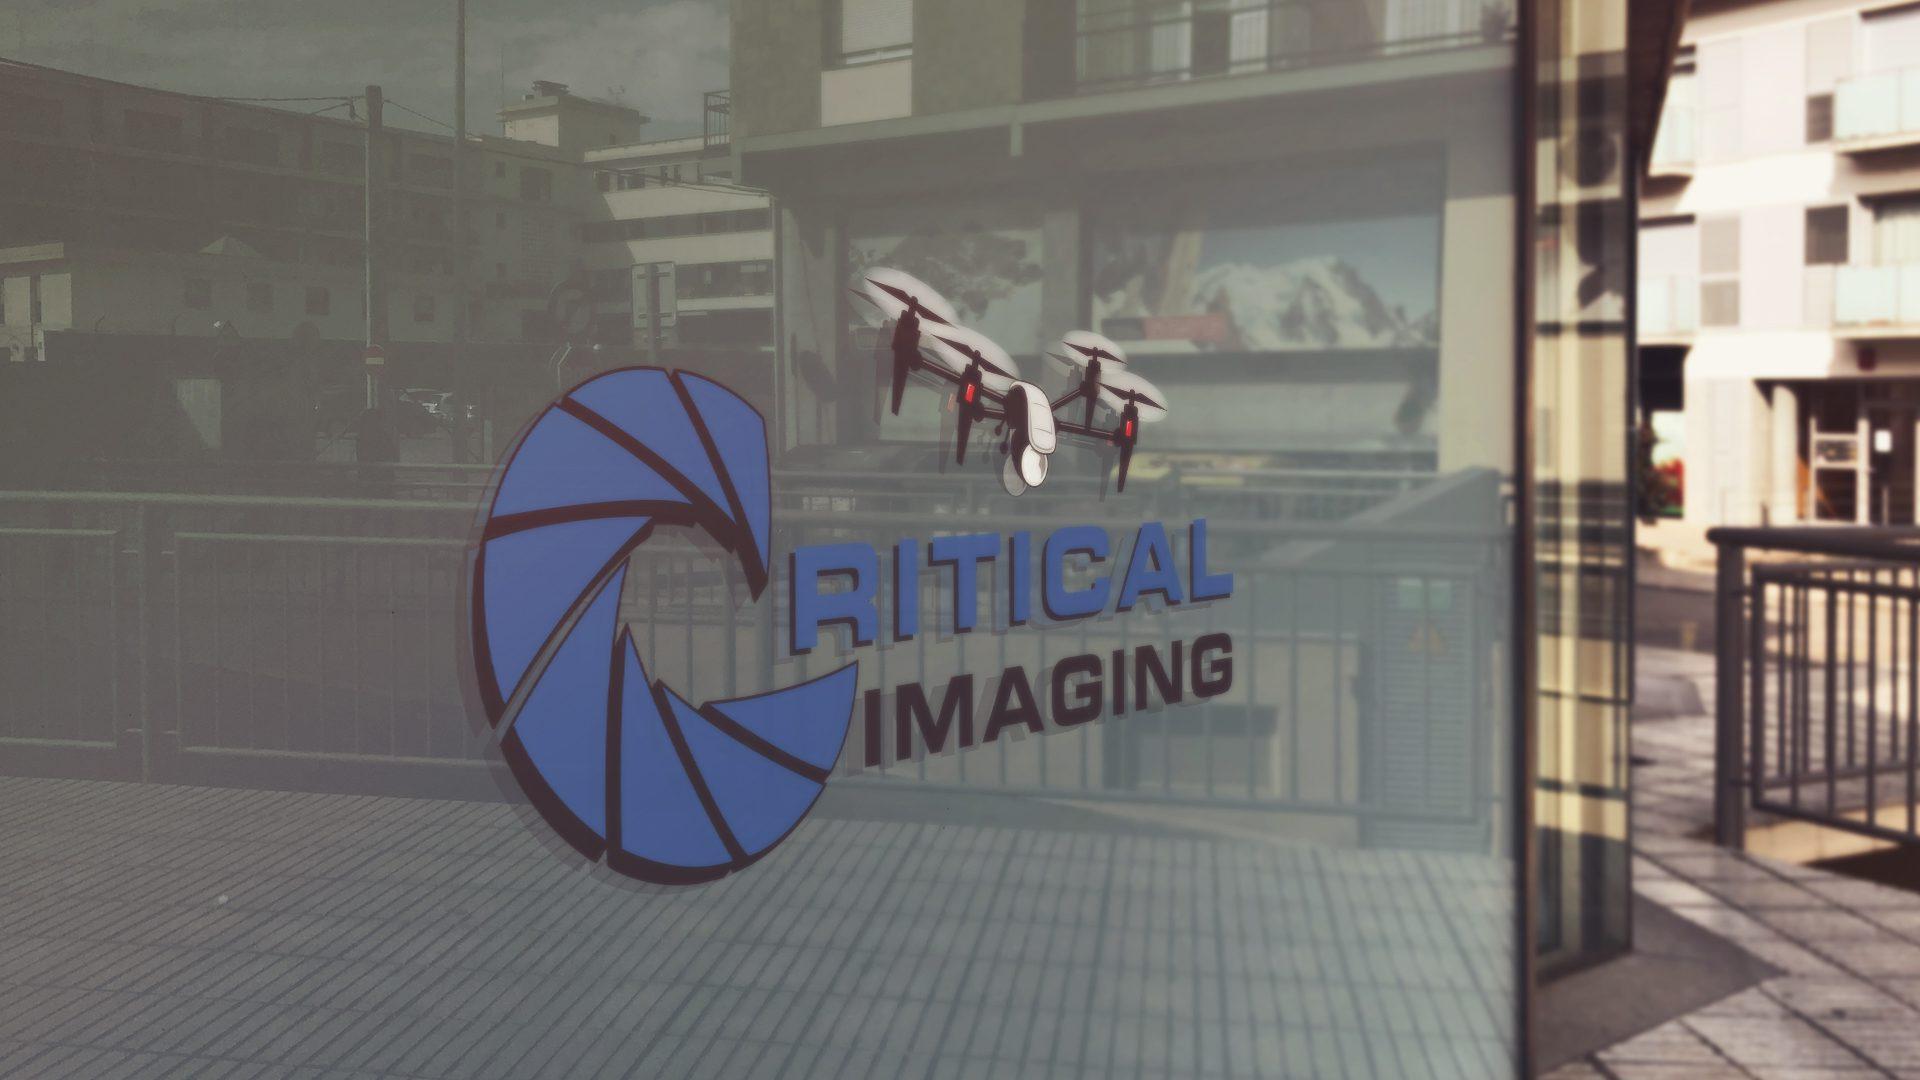 Critical Imaging - Logo Mockup (2)